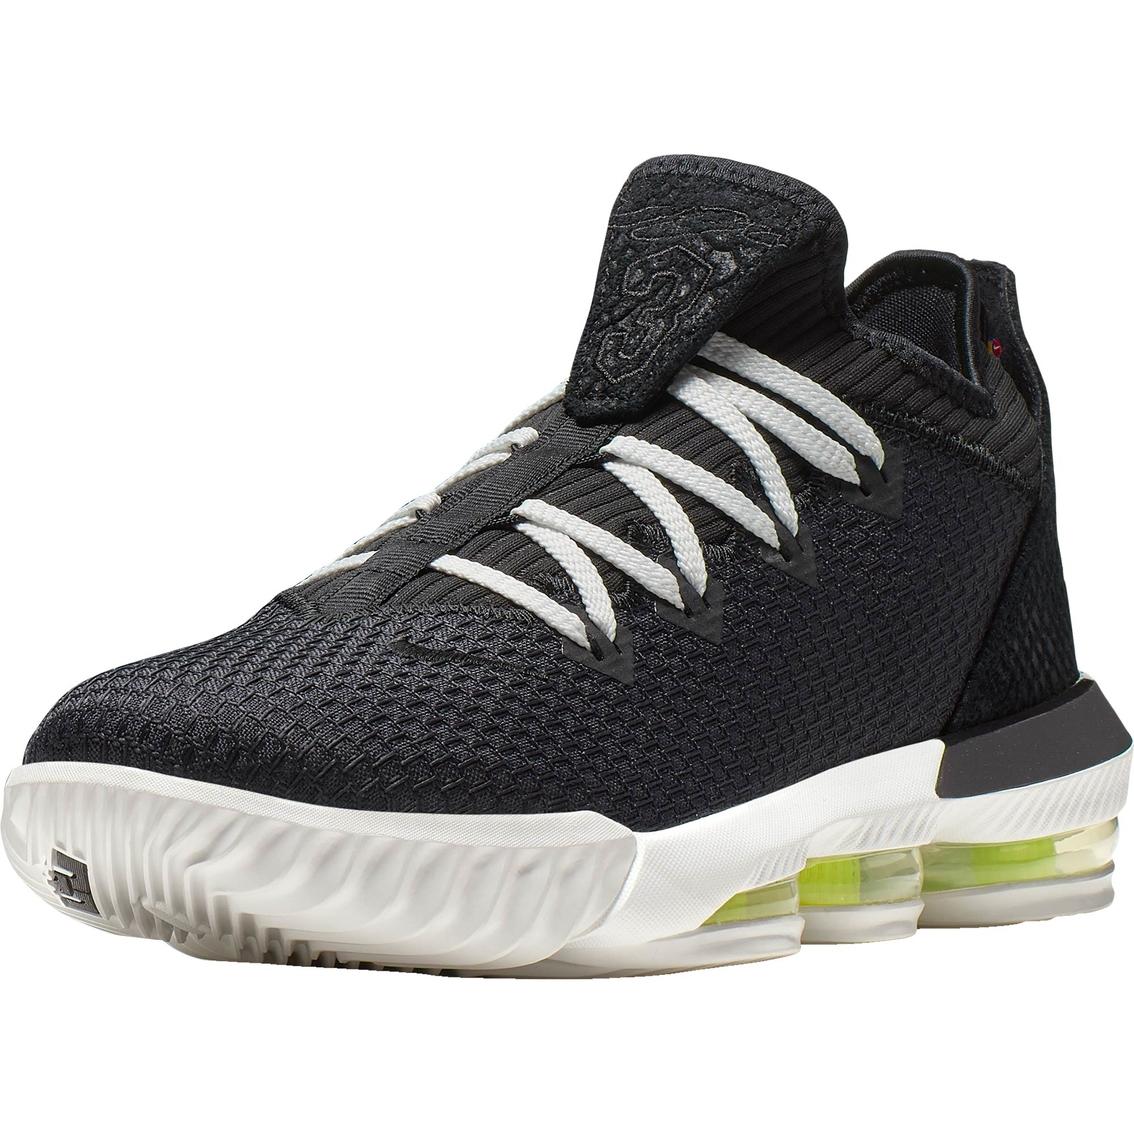 new arrival b2445 c5fa9 Nike Men's Lebron Xvi Low Basketball Shoes   Basketball ...